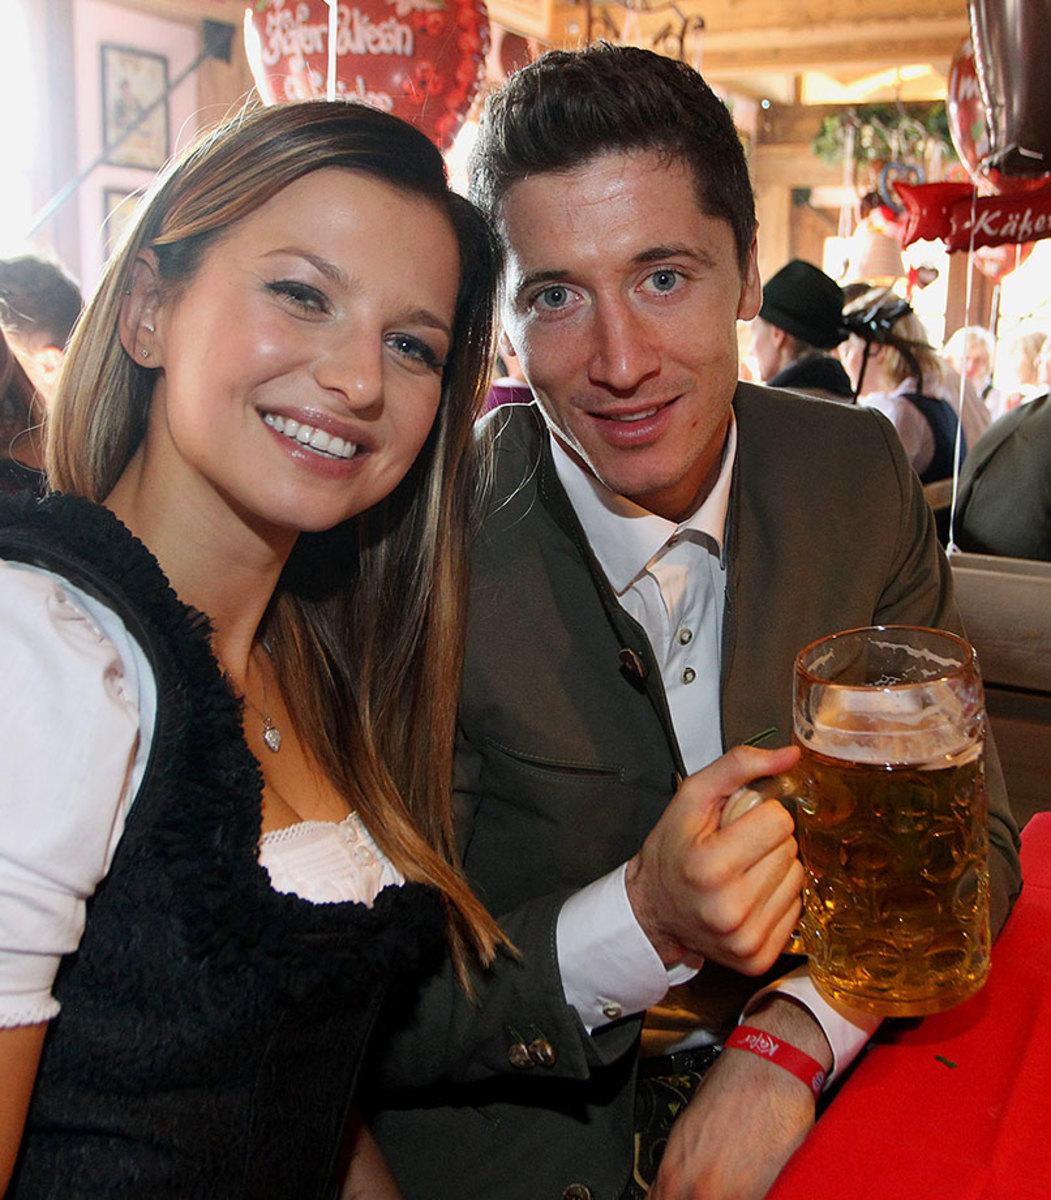 Robert-Lewandowski-wife-Anna-Oktoberfest-490648944.jpg